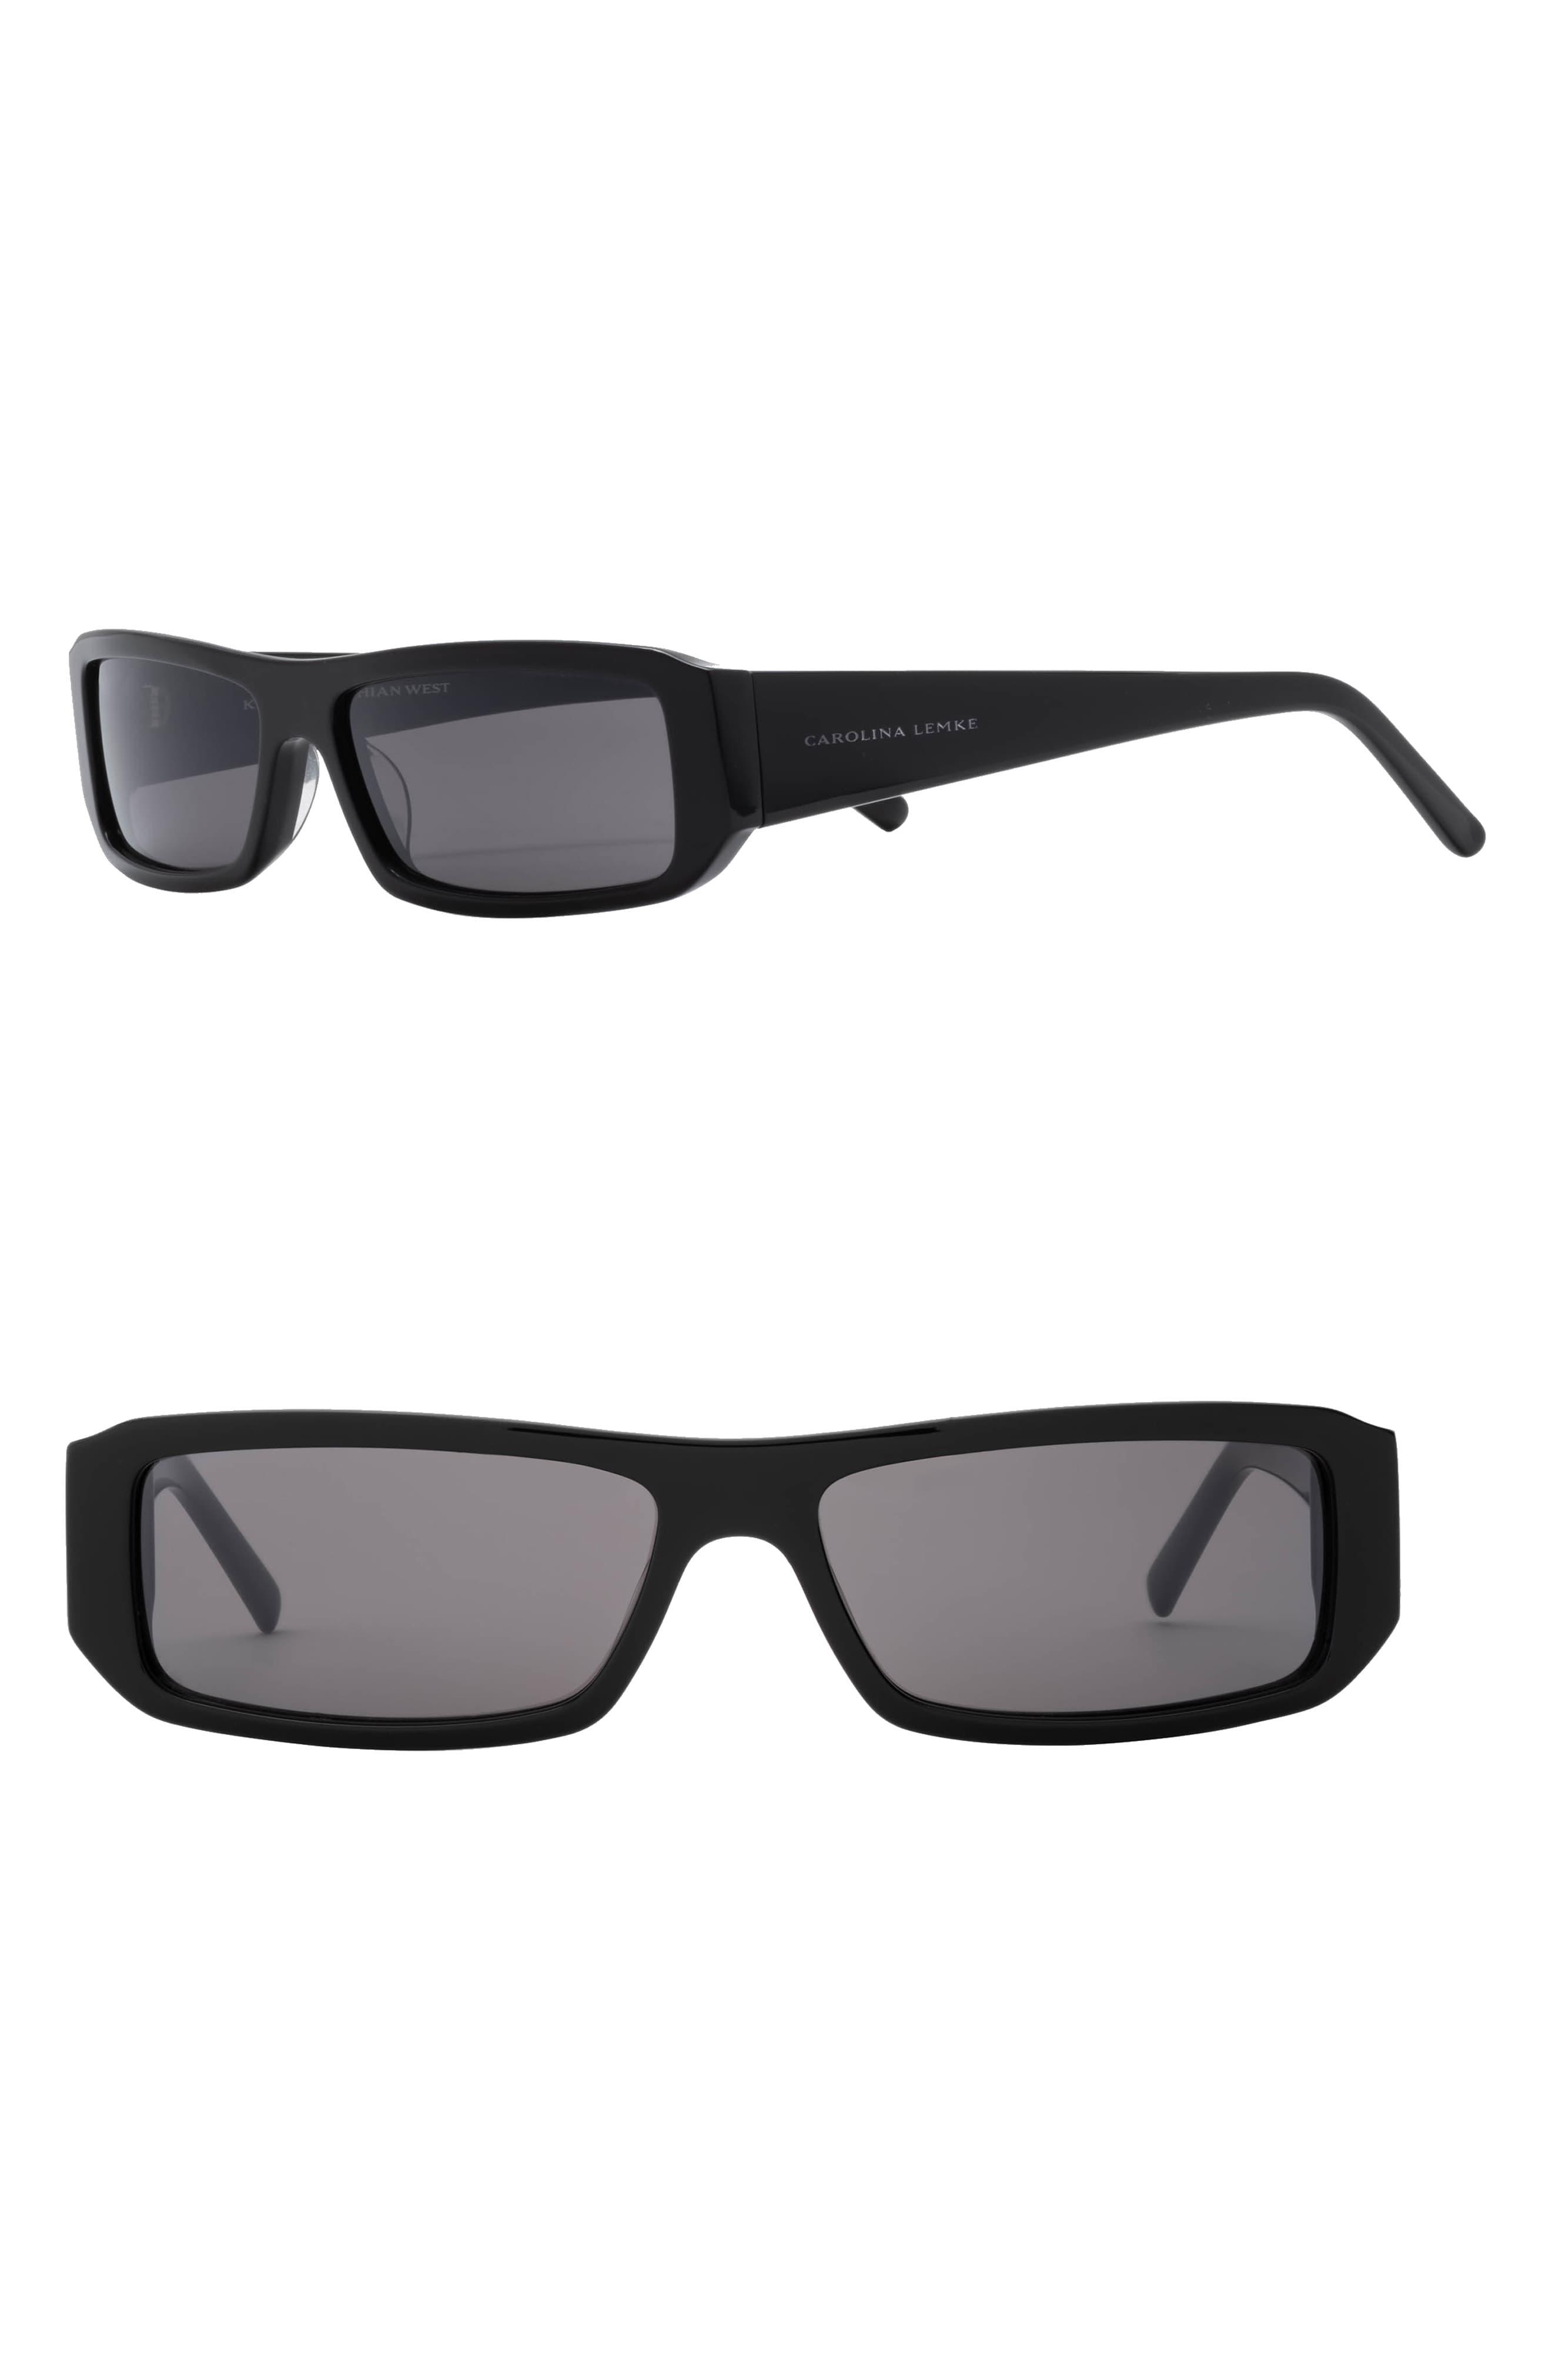 x KKW Dusk 55mm Rectangle Sunglasses by Carolina Lemke, available on nordstrom.com for $90 Kendall Jenner Sunglasses Exact Product